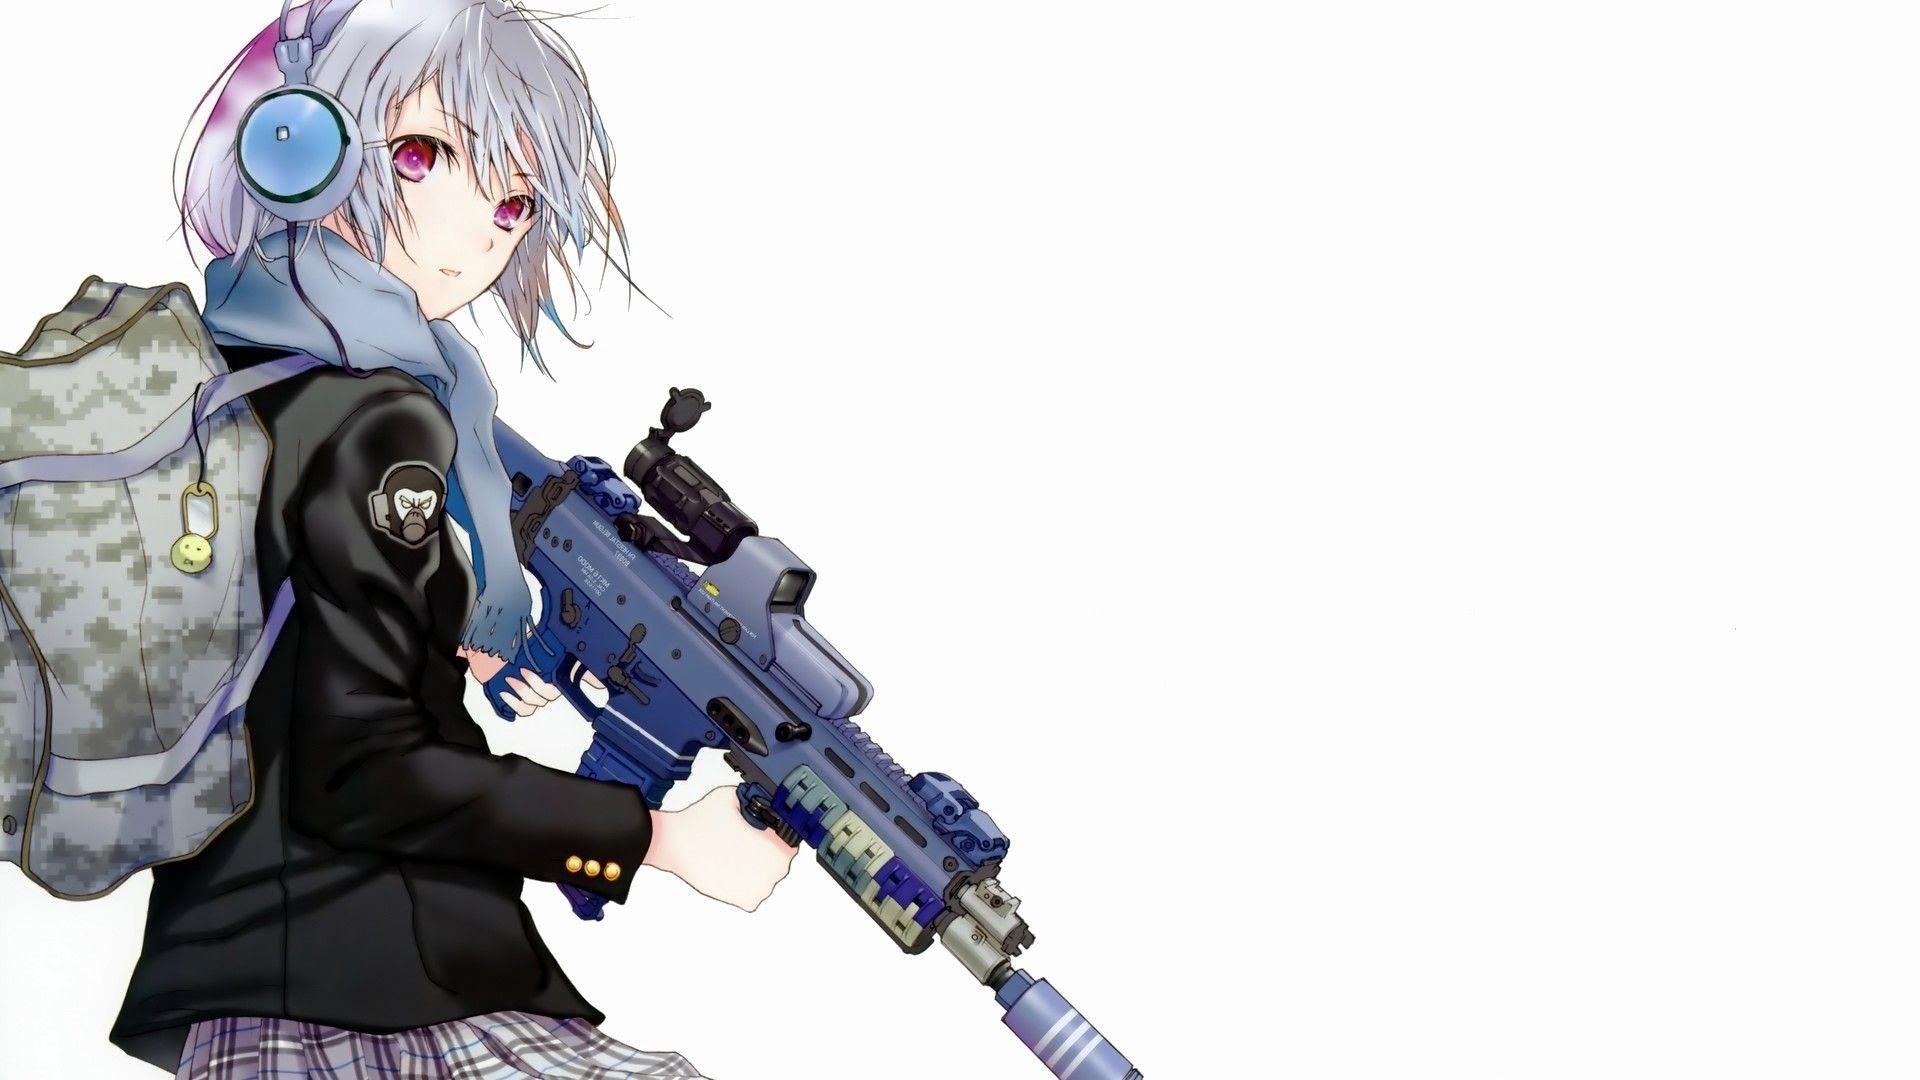 Res: 1920x1080, Anime Gun Wallpaper 1920X1080 Widescreen 2 HD Wallpapers